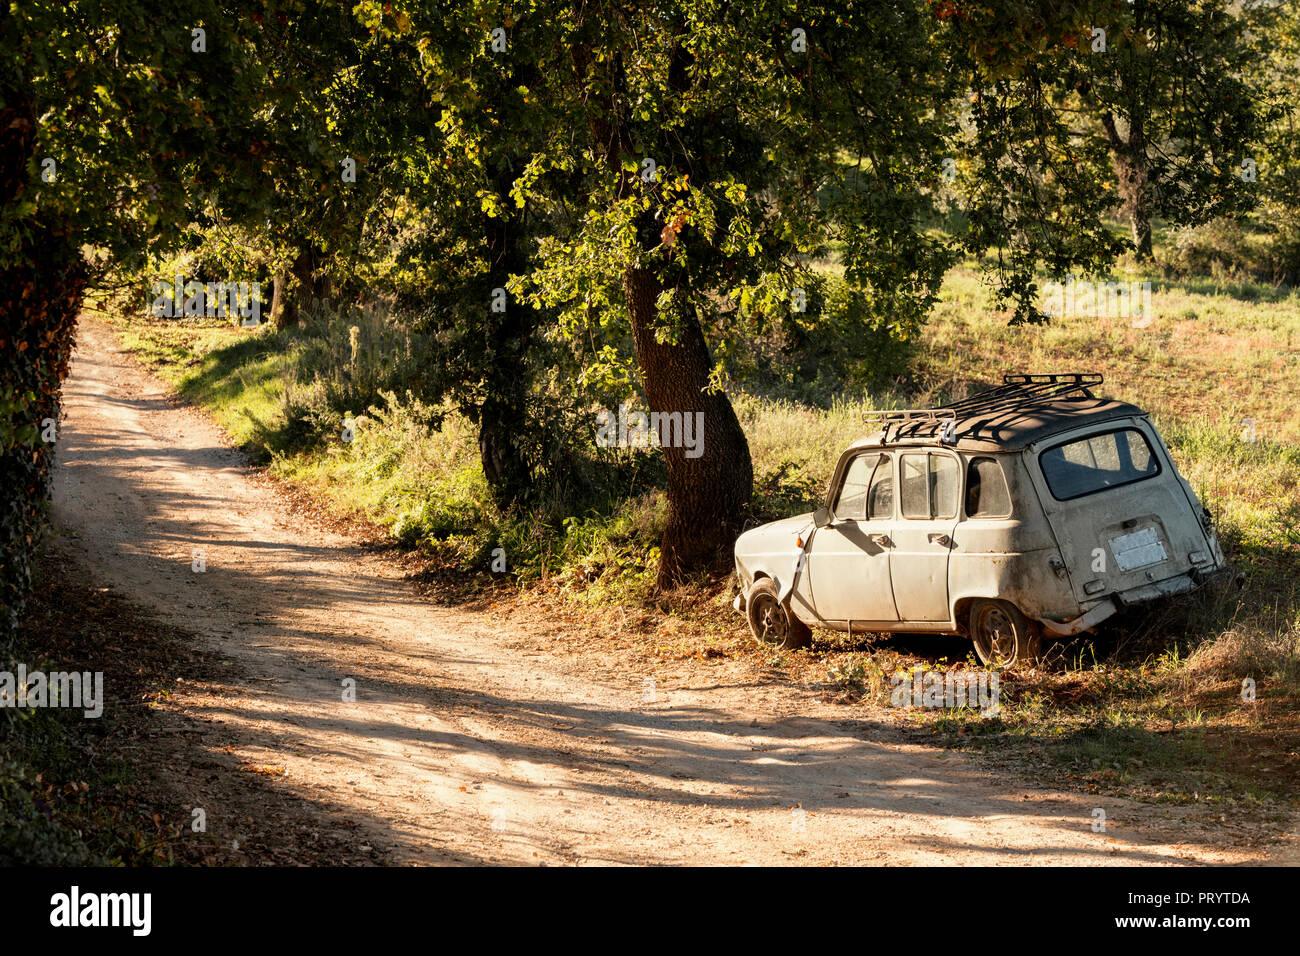 Italy, Tuscany, obsolete car at the wayside - Stock Image